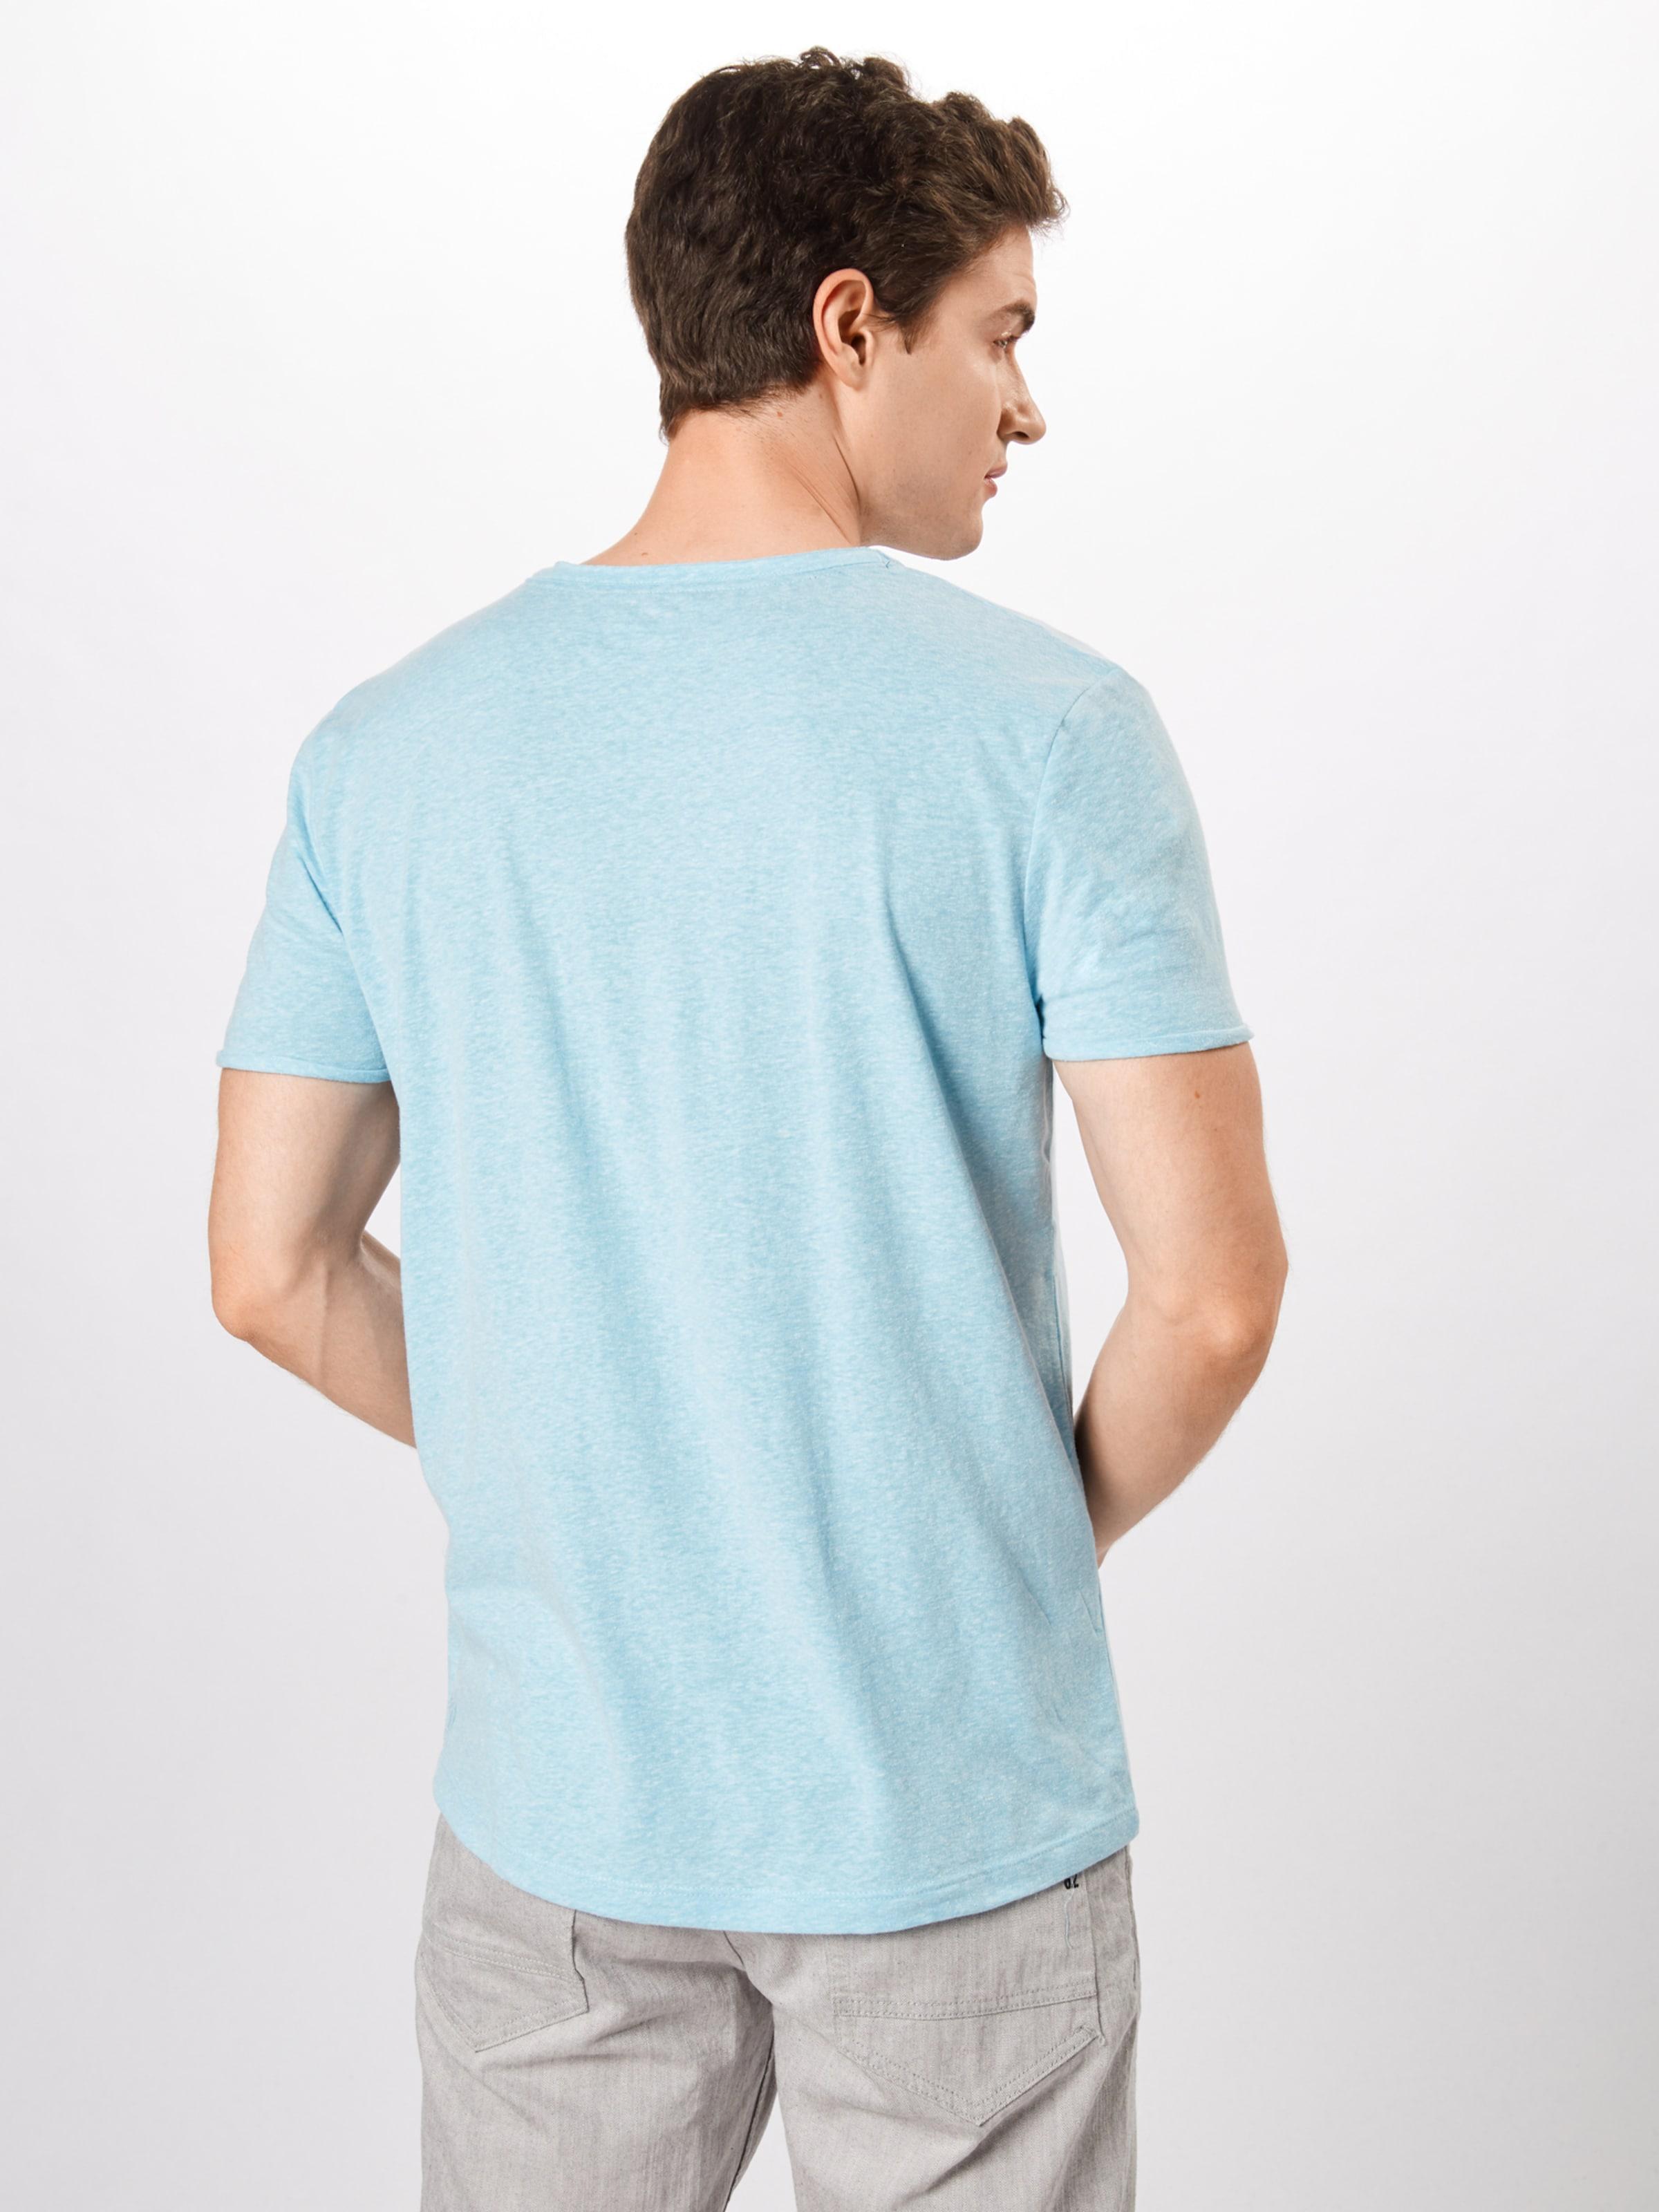 In Denim Tom Tailor T shirt Hellblau bf6g7Yy